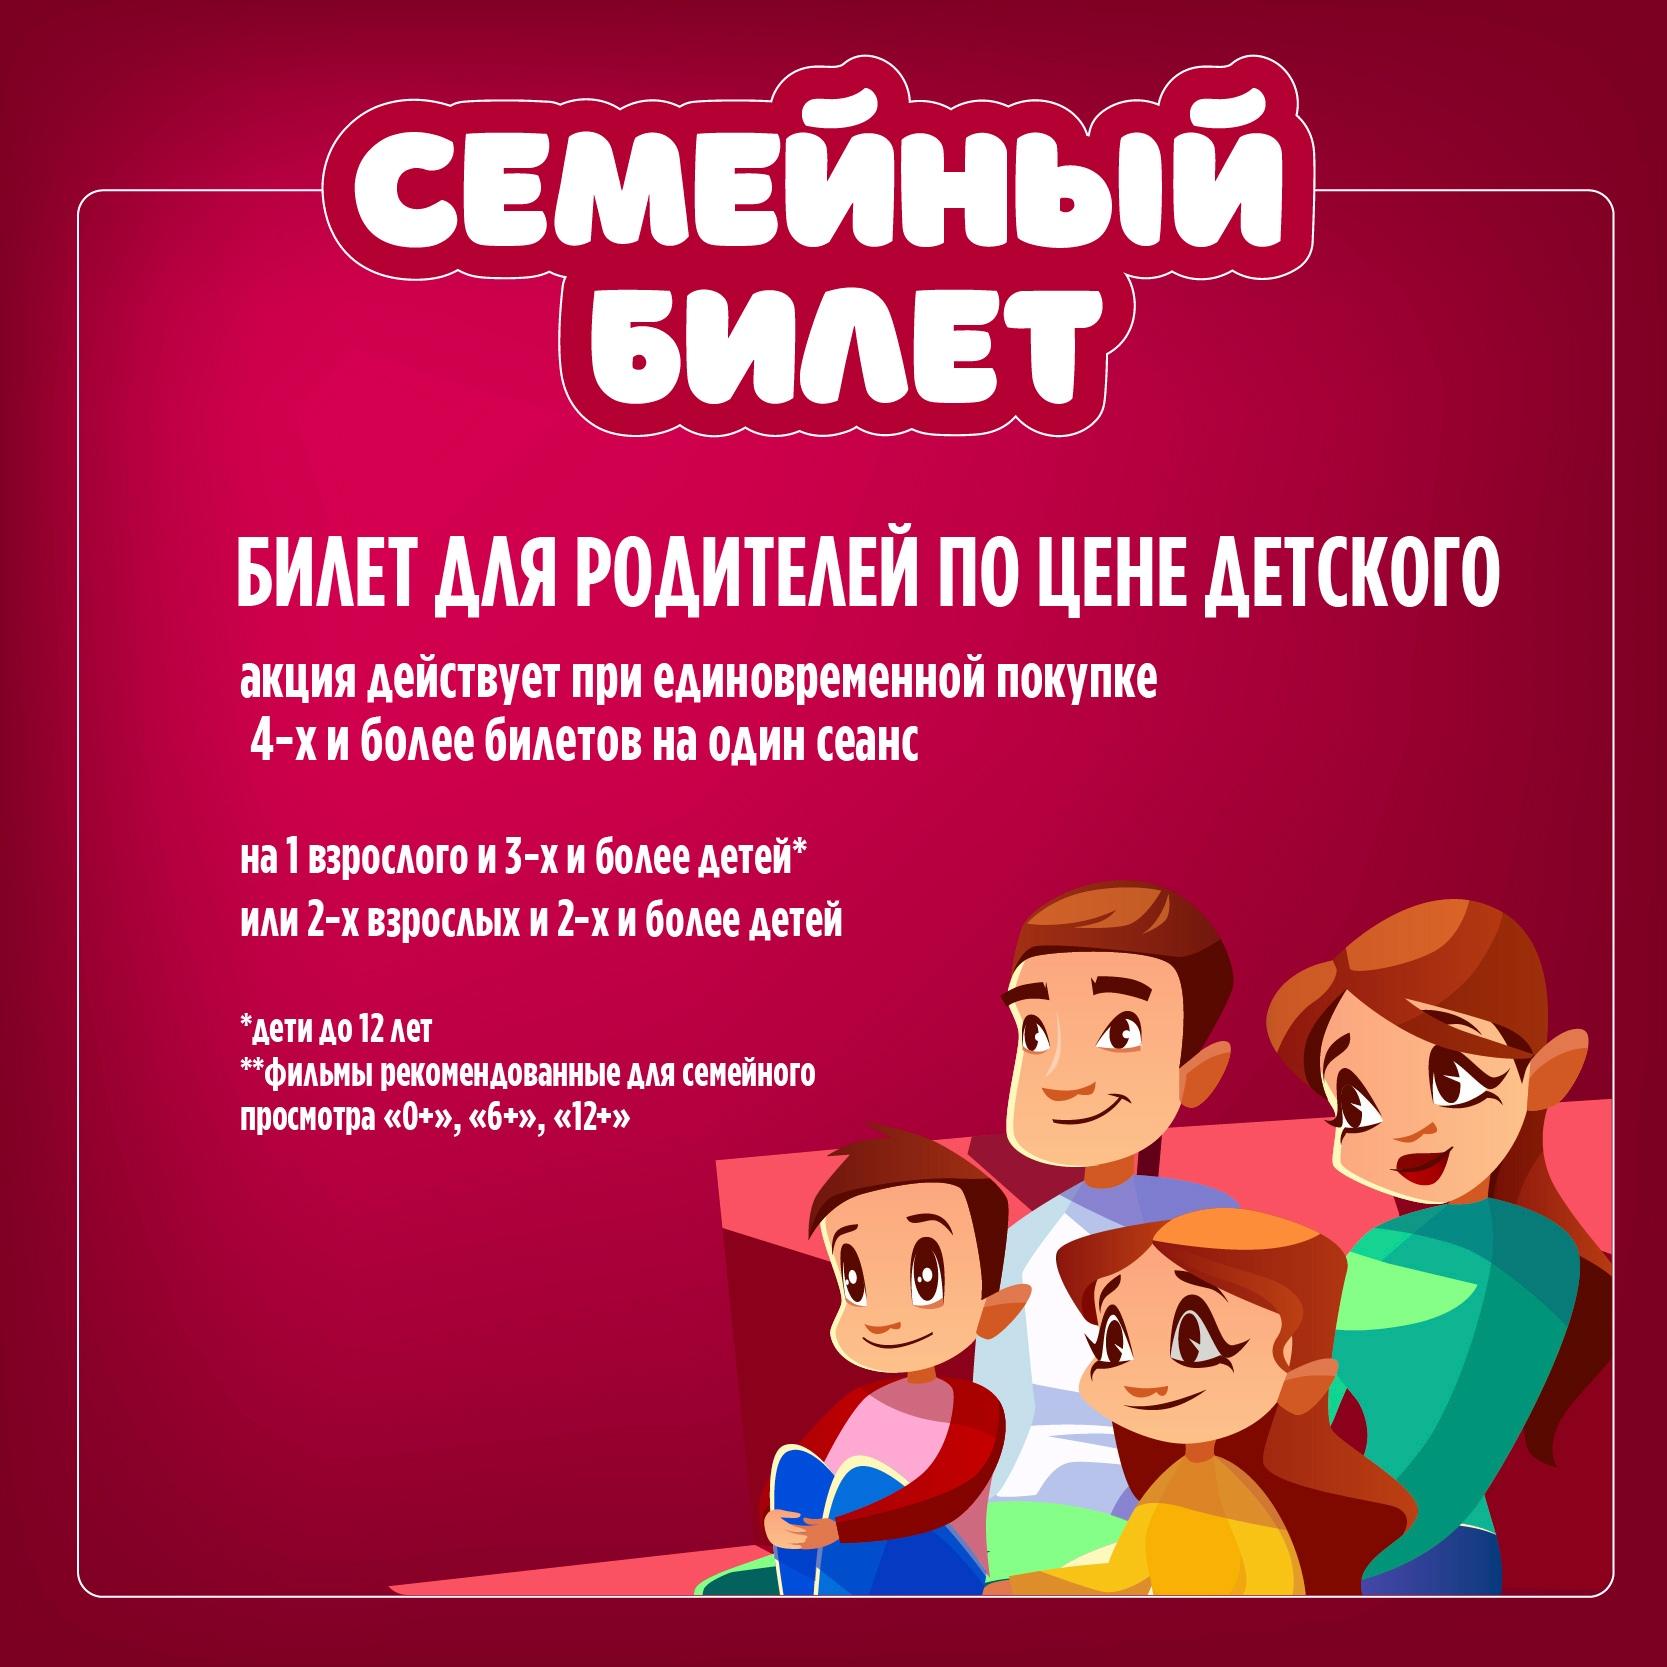 Акция «Семейный билет»